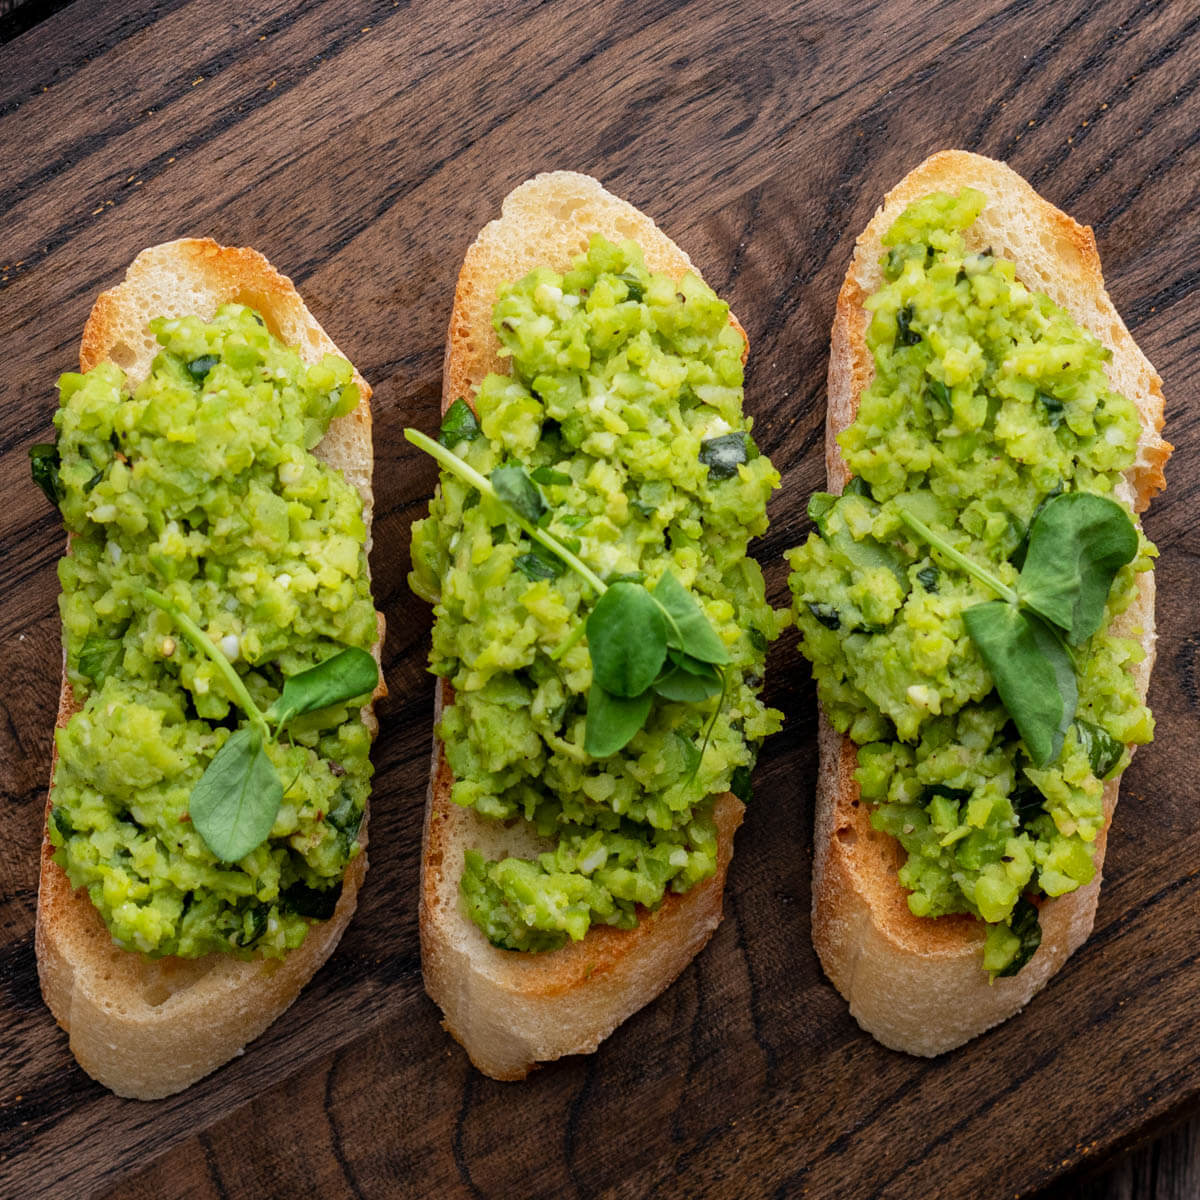 Three fava bean crostini topped with bright green fava bean puree.